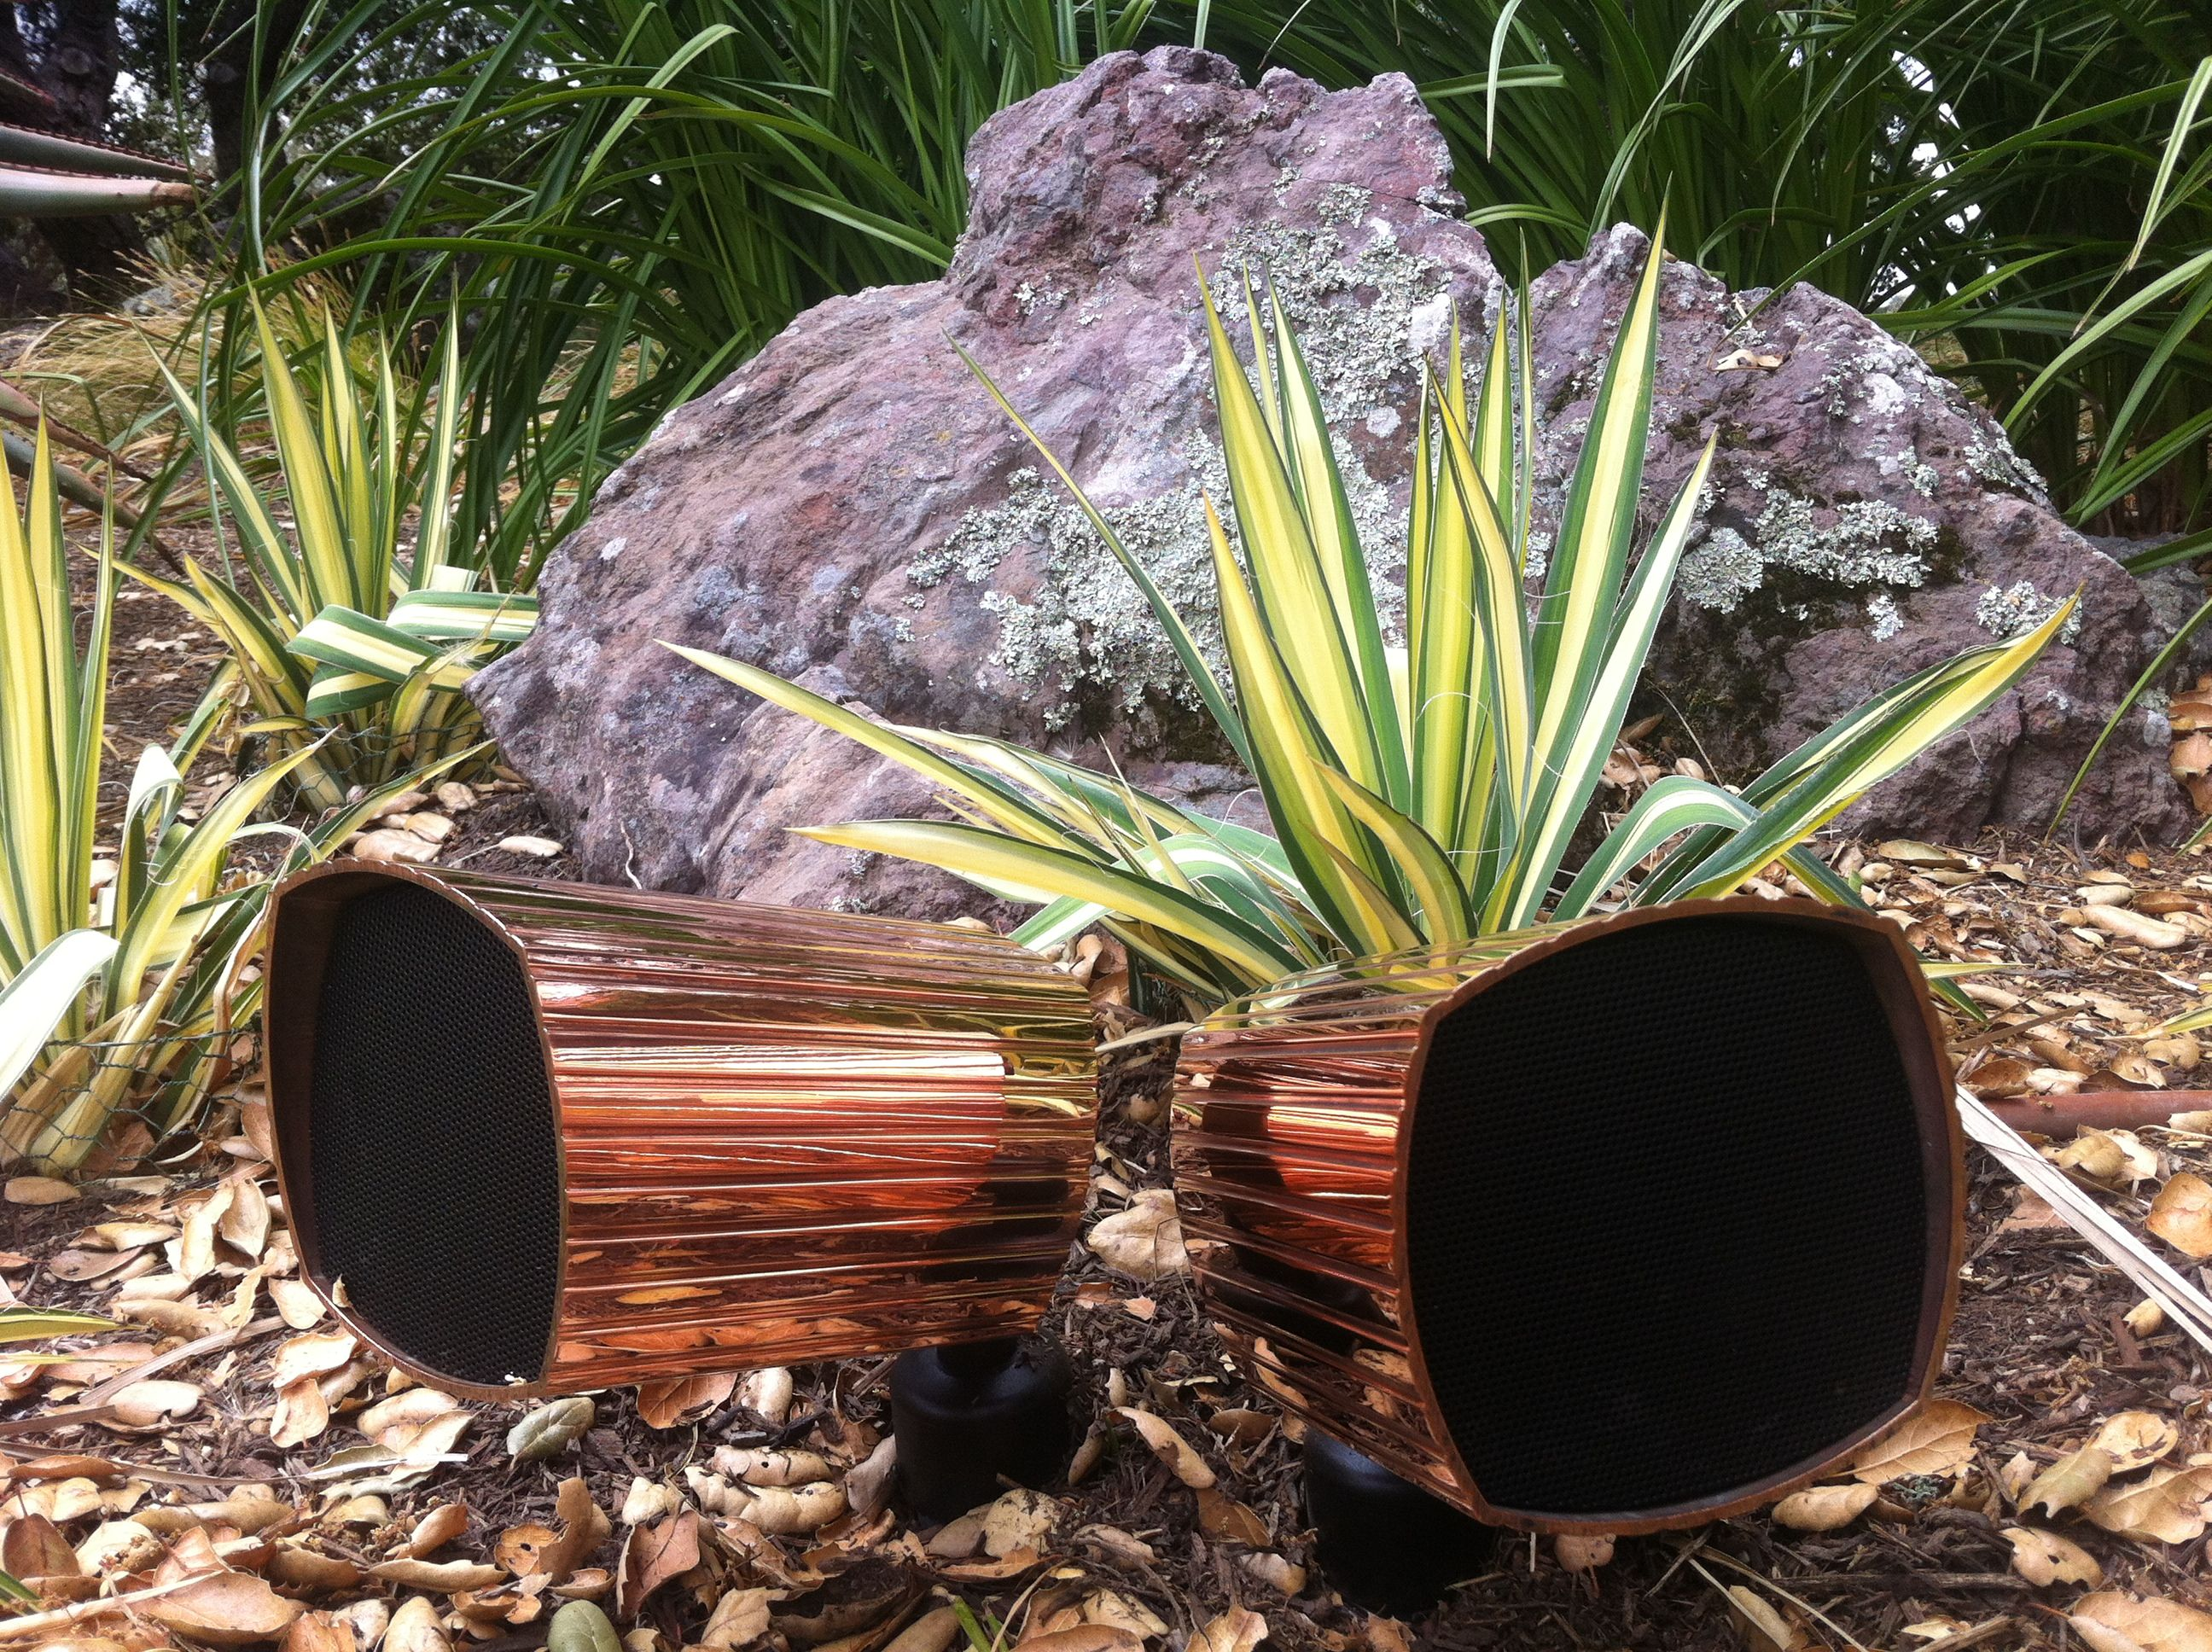 James Loudspeaker Landscape Series 70 Volt System Loudspeaker Audio Speakers Audio Video